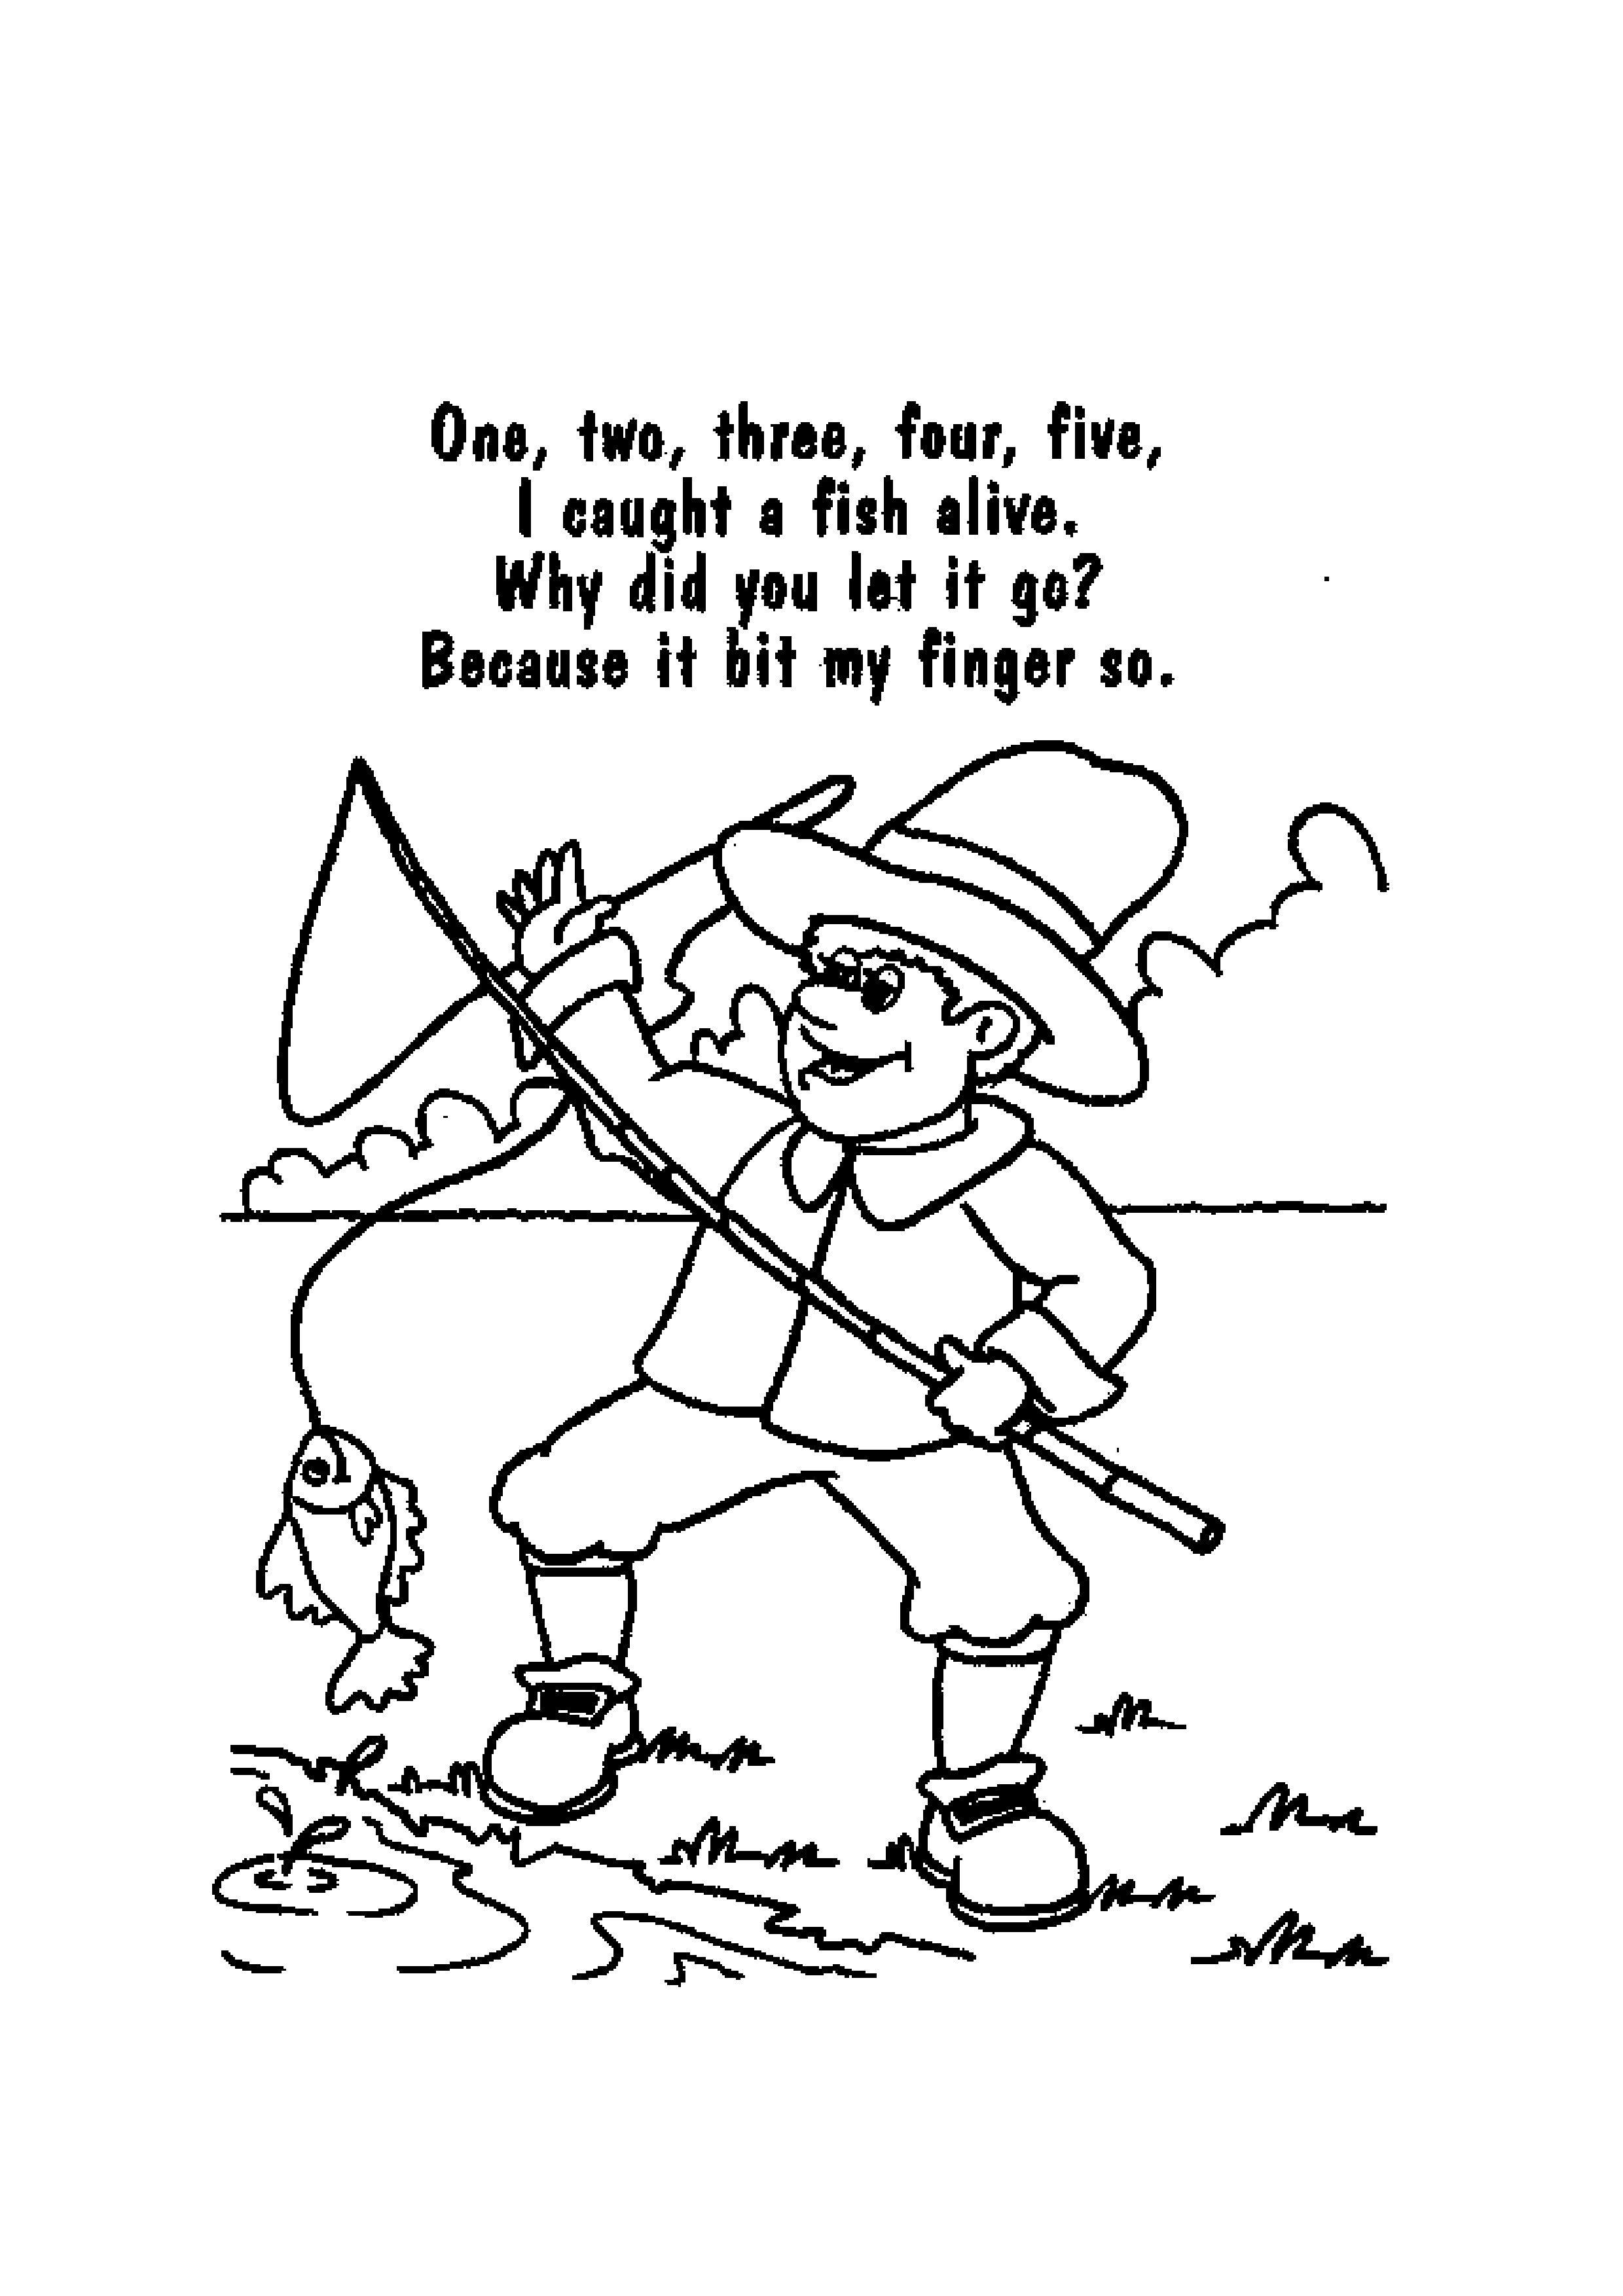 Coloring Sheets Nursery Rhymes Gambarin Us - Nursery Rhymes Coloring - Free Printable Nursery Rhyme Coloring Pages